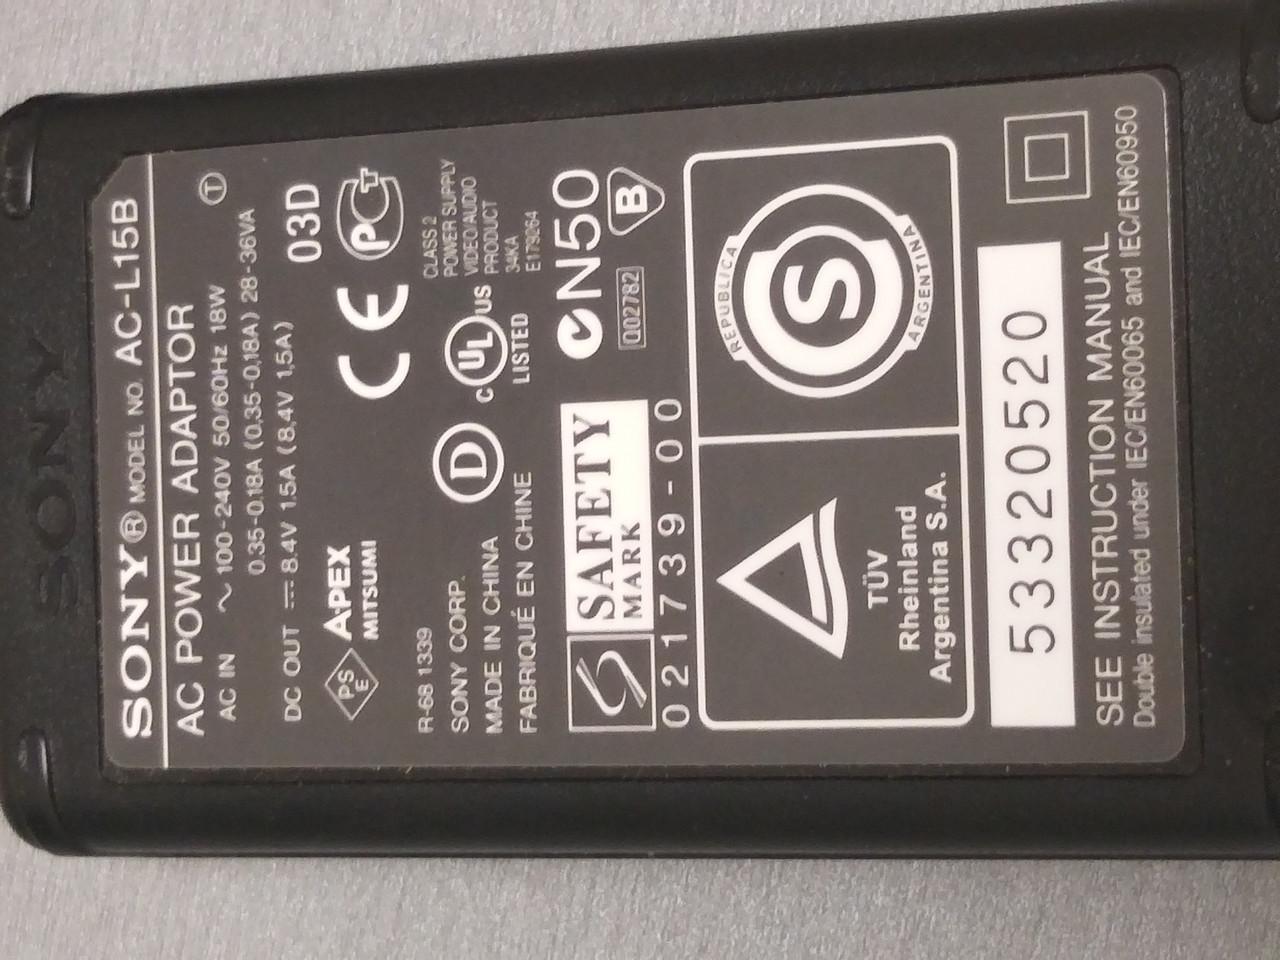 Блок питания 8,4 V 1,5 A ACL 15